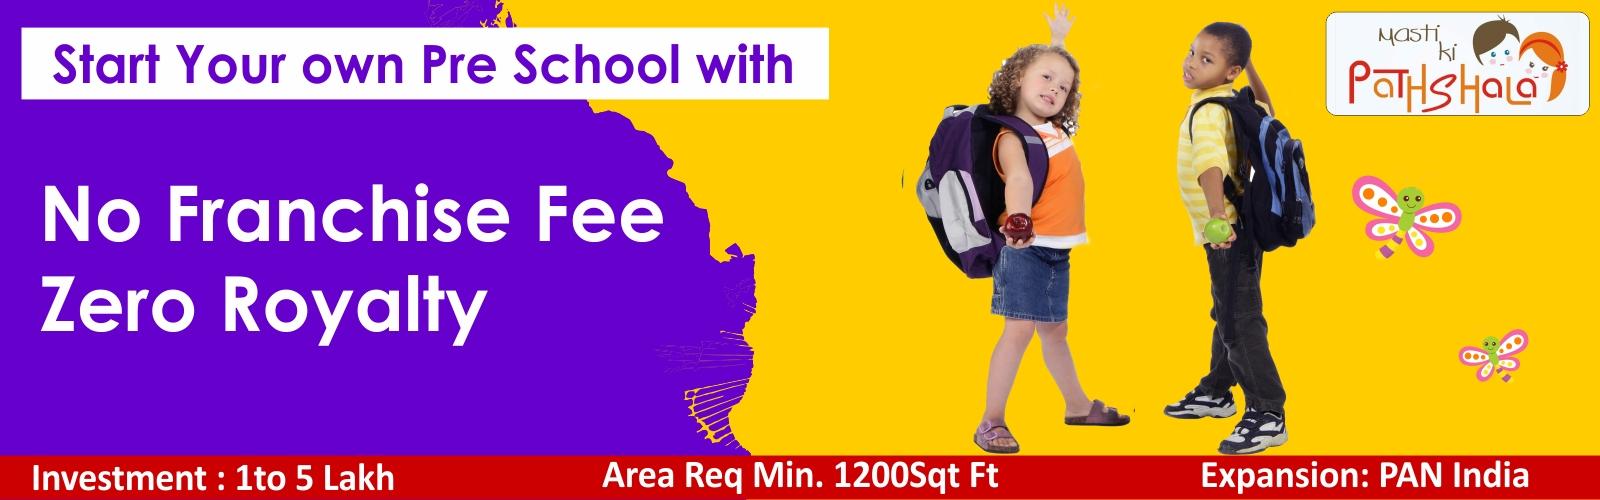 admin/photos/Pathshala (Pre / Play School Franchise)